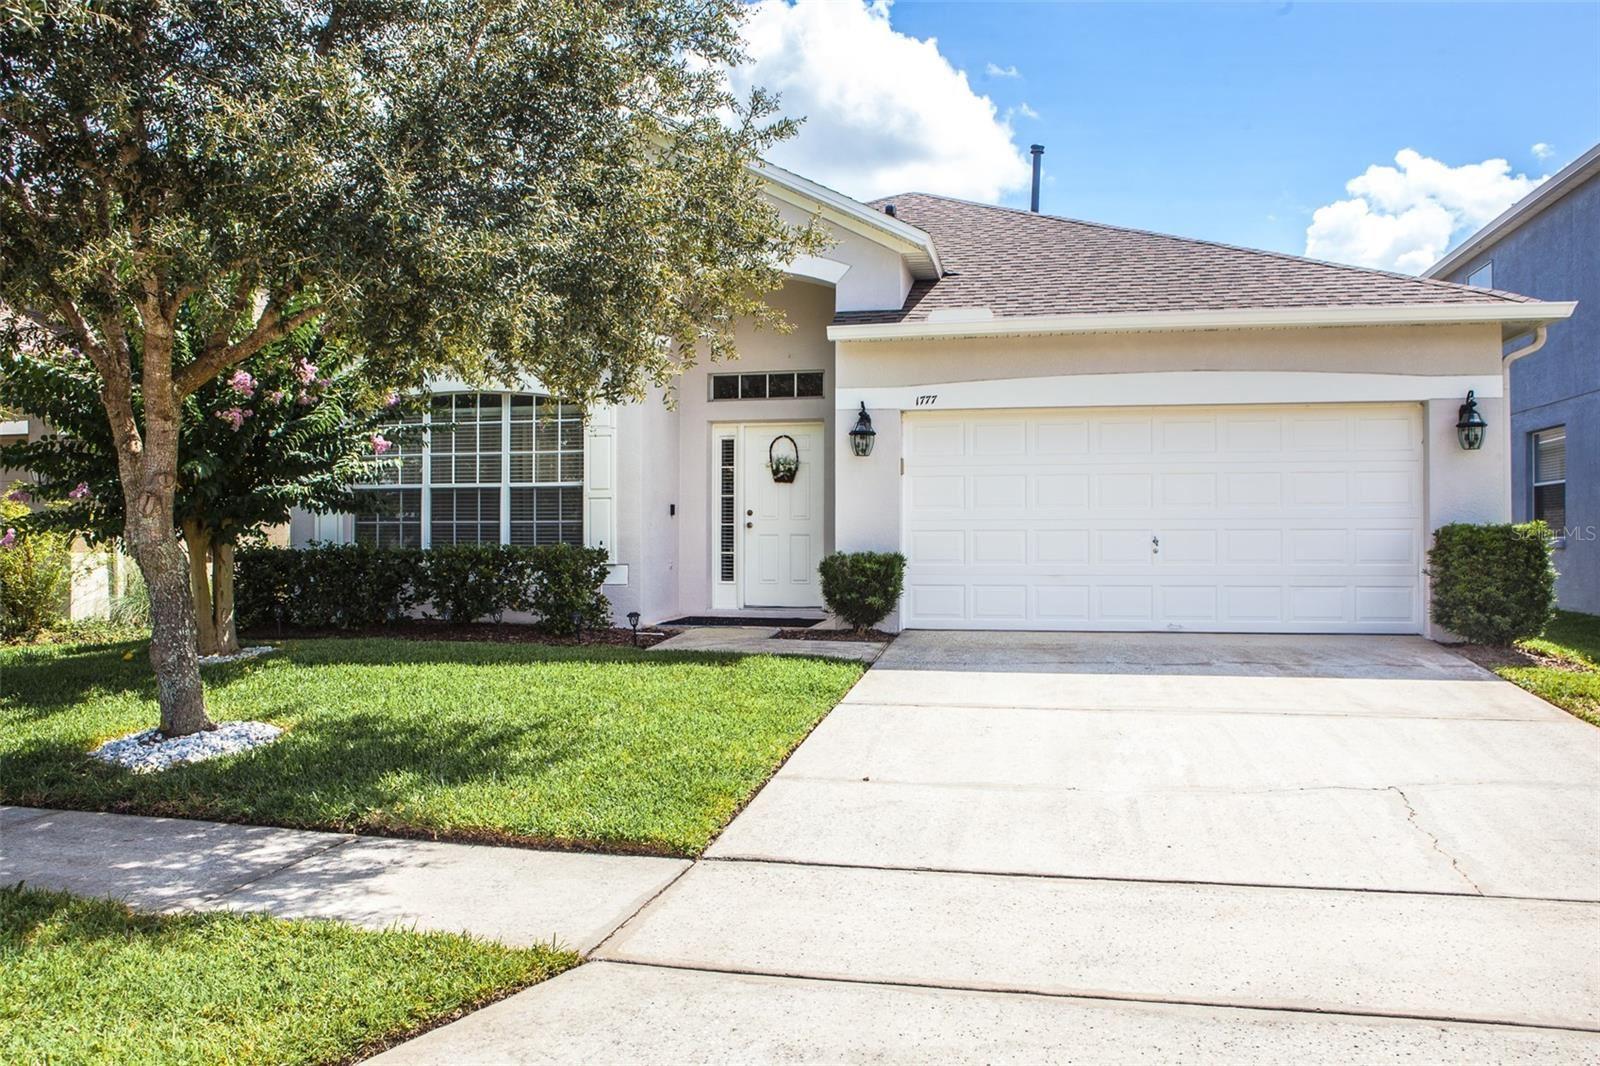 1777 ANNA CATHERINE DRIVE, Orlando, FL 32828 - #: O5959067